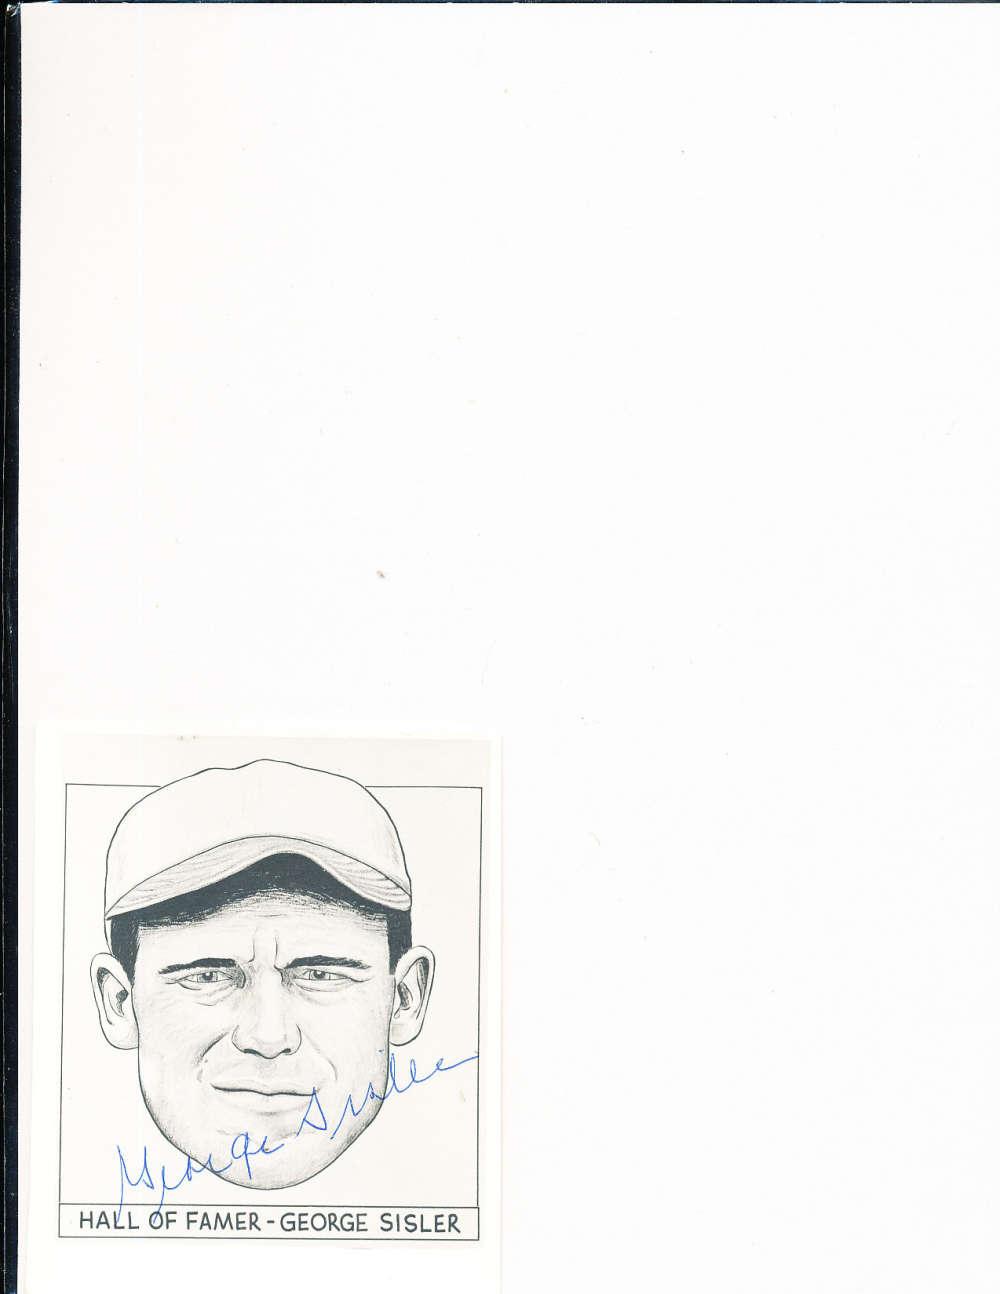 George Sisler Browns HOF 4x5 Signed Picture